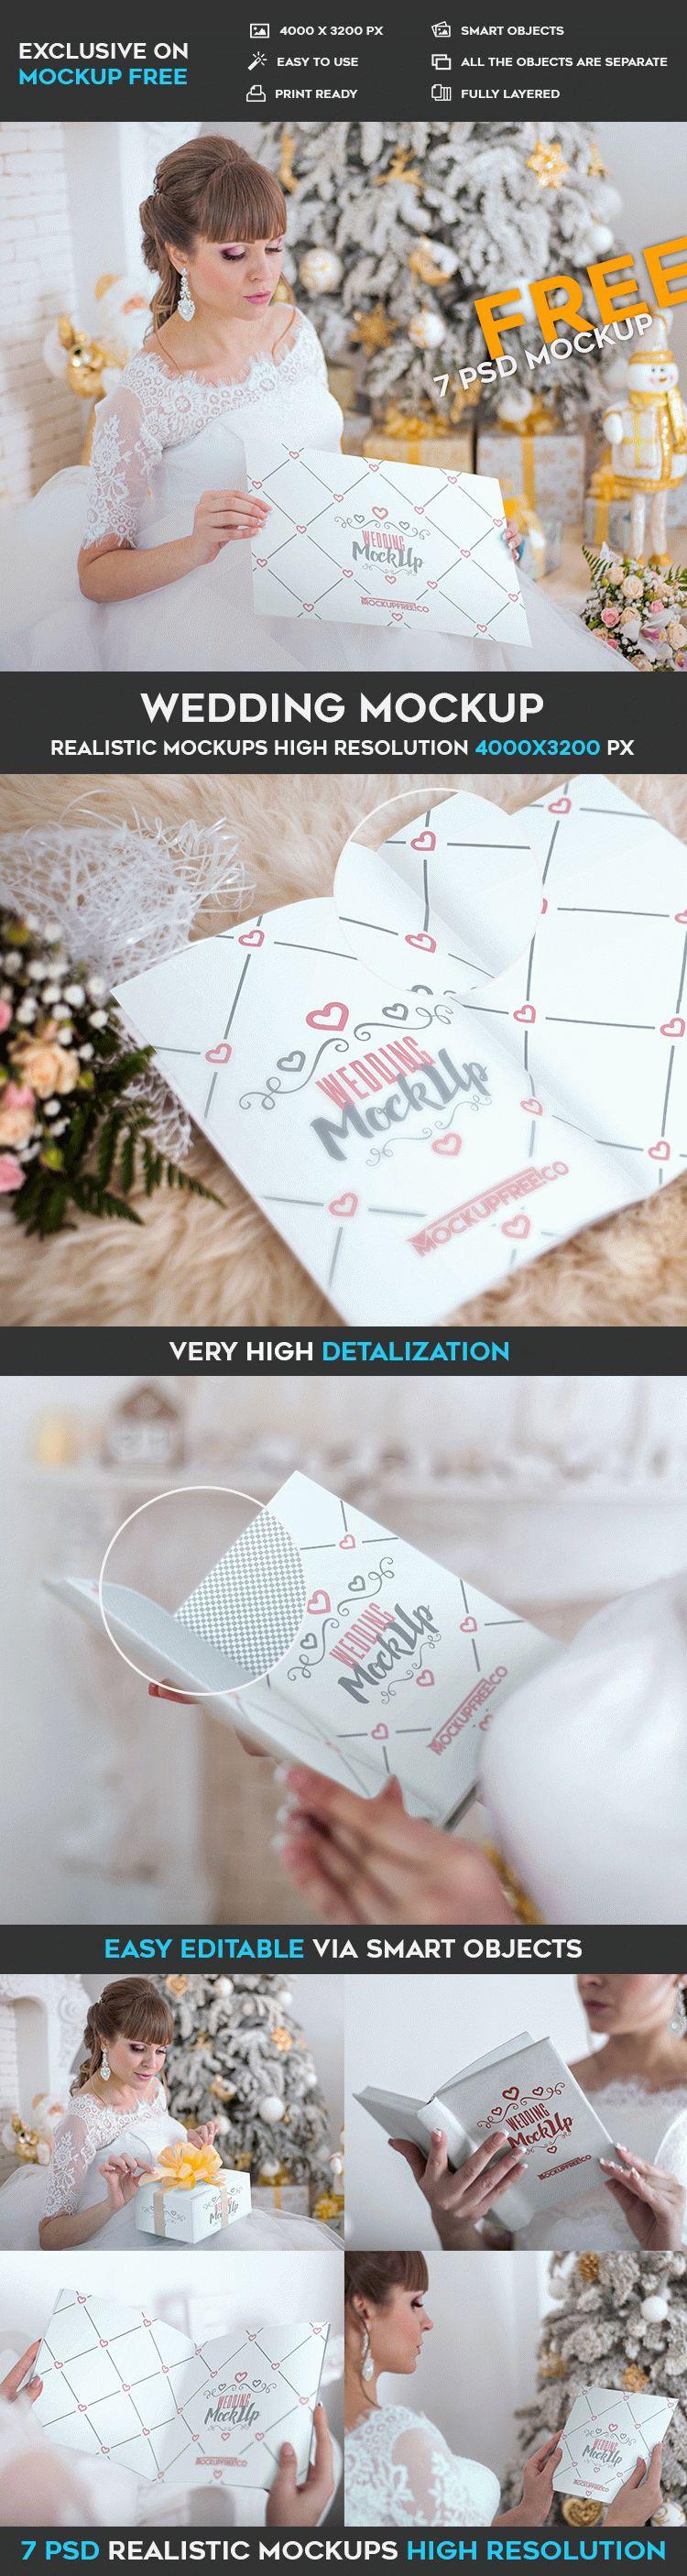 7 Free Wedding Invitation, Poster, Book PSD Mockups | Free PSD ...